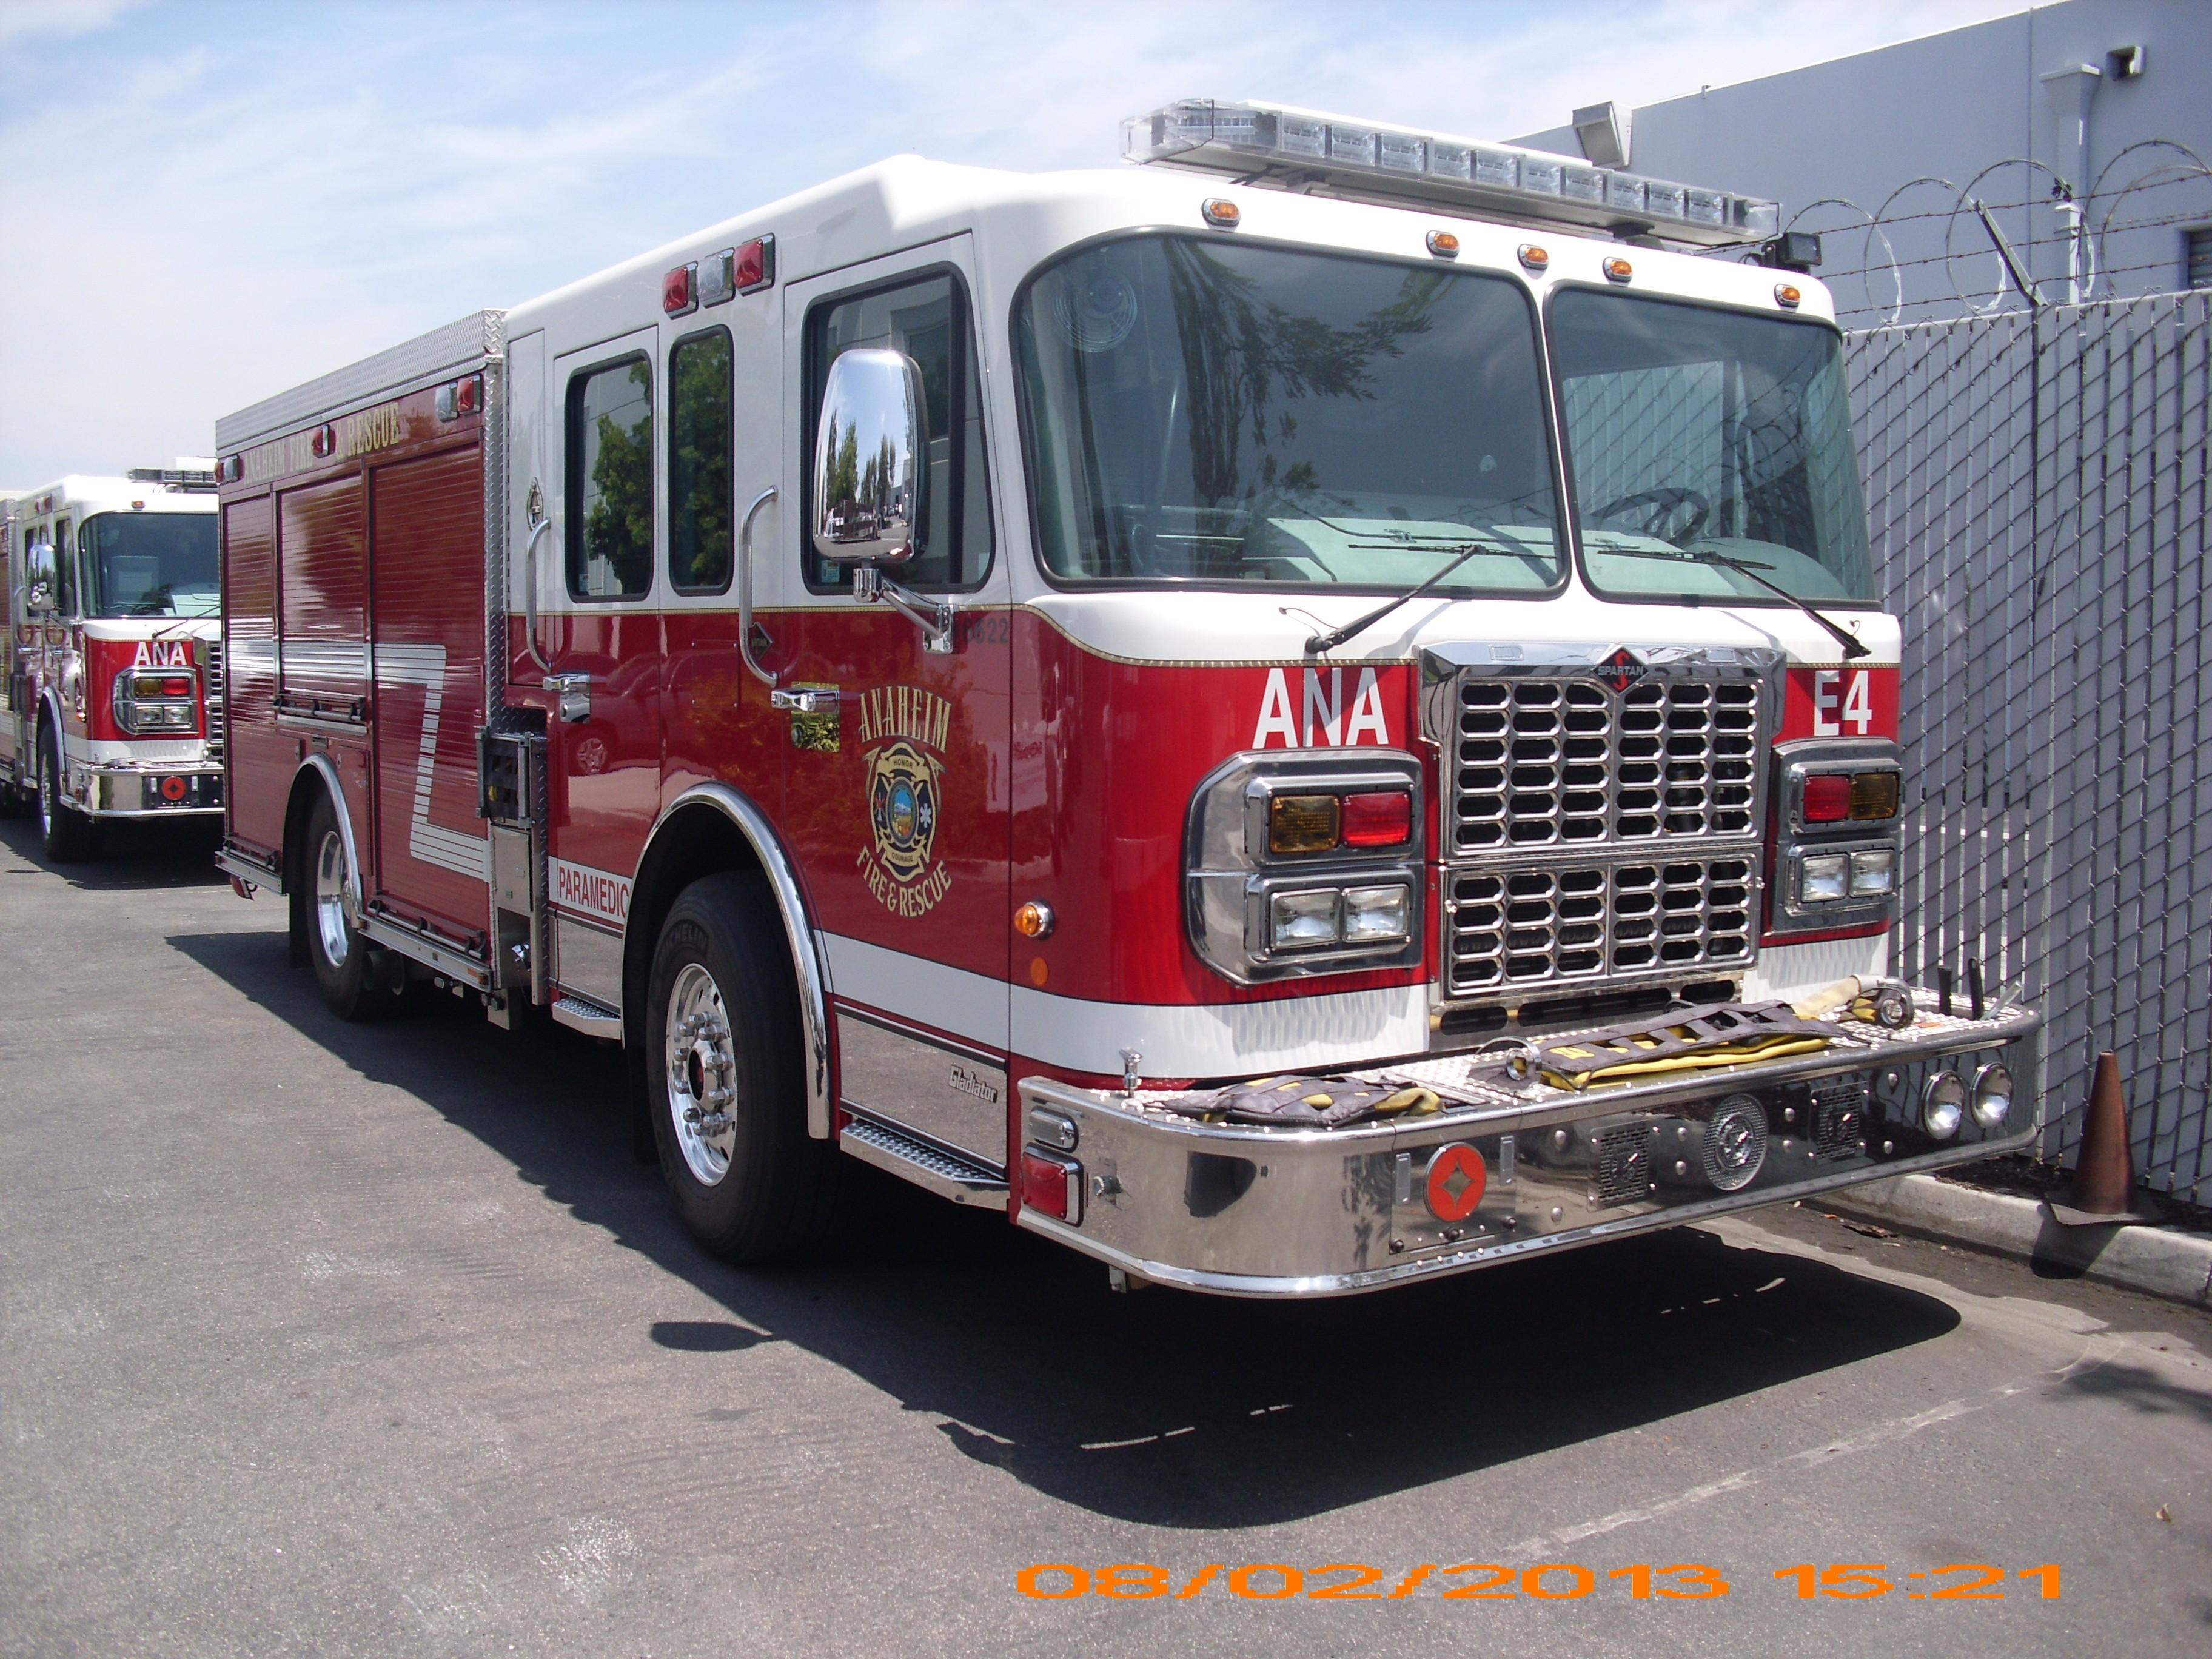 Wallpaper ANAHEIM CALIFORNIA FIRE TRUCK Truck Emergency Fire Kool 3648x2736